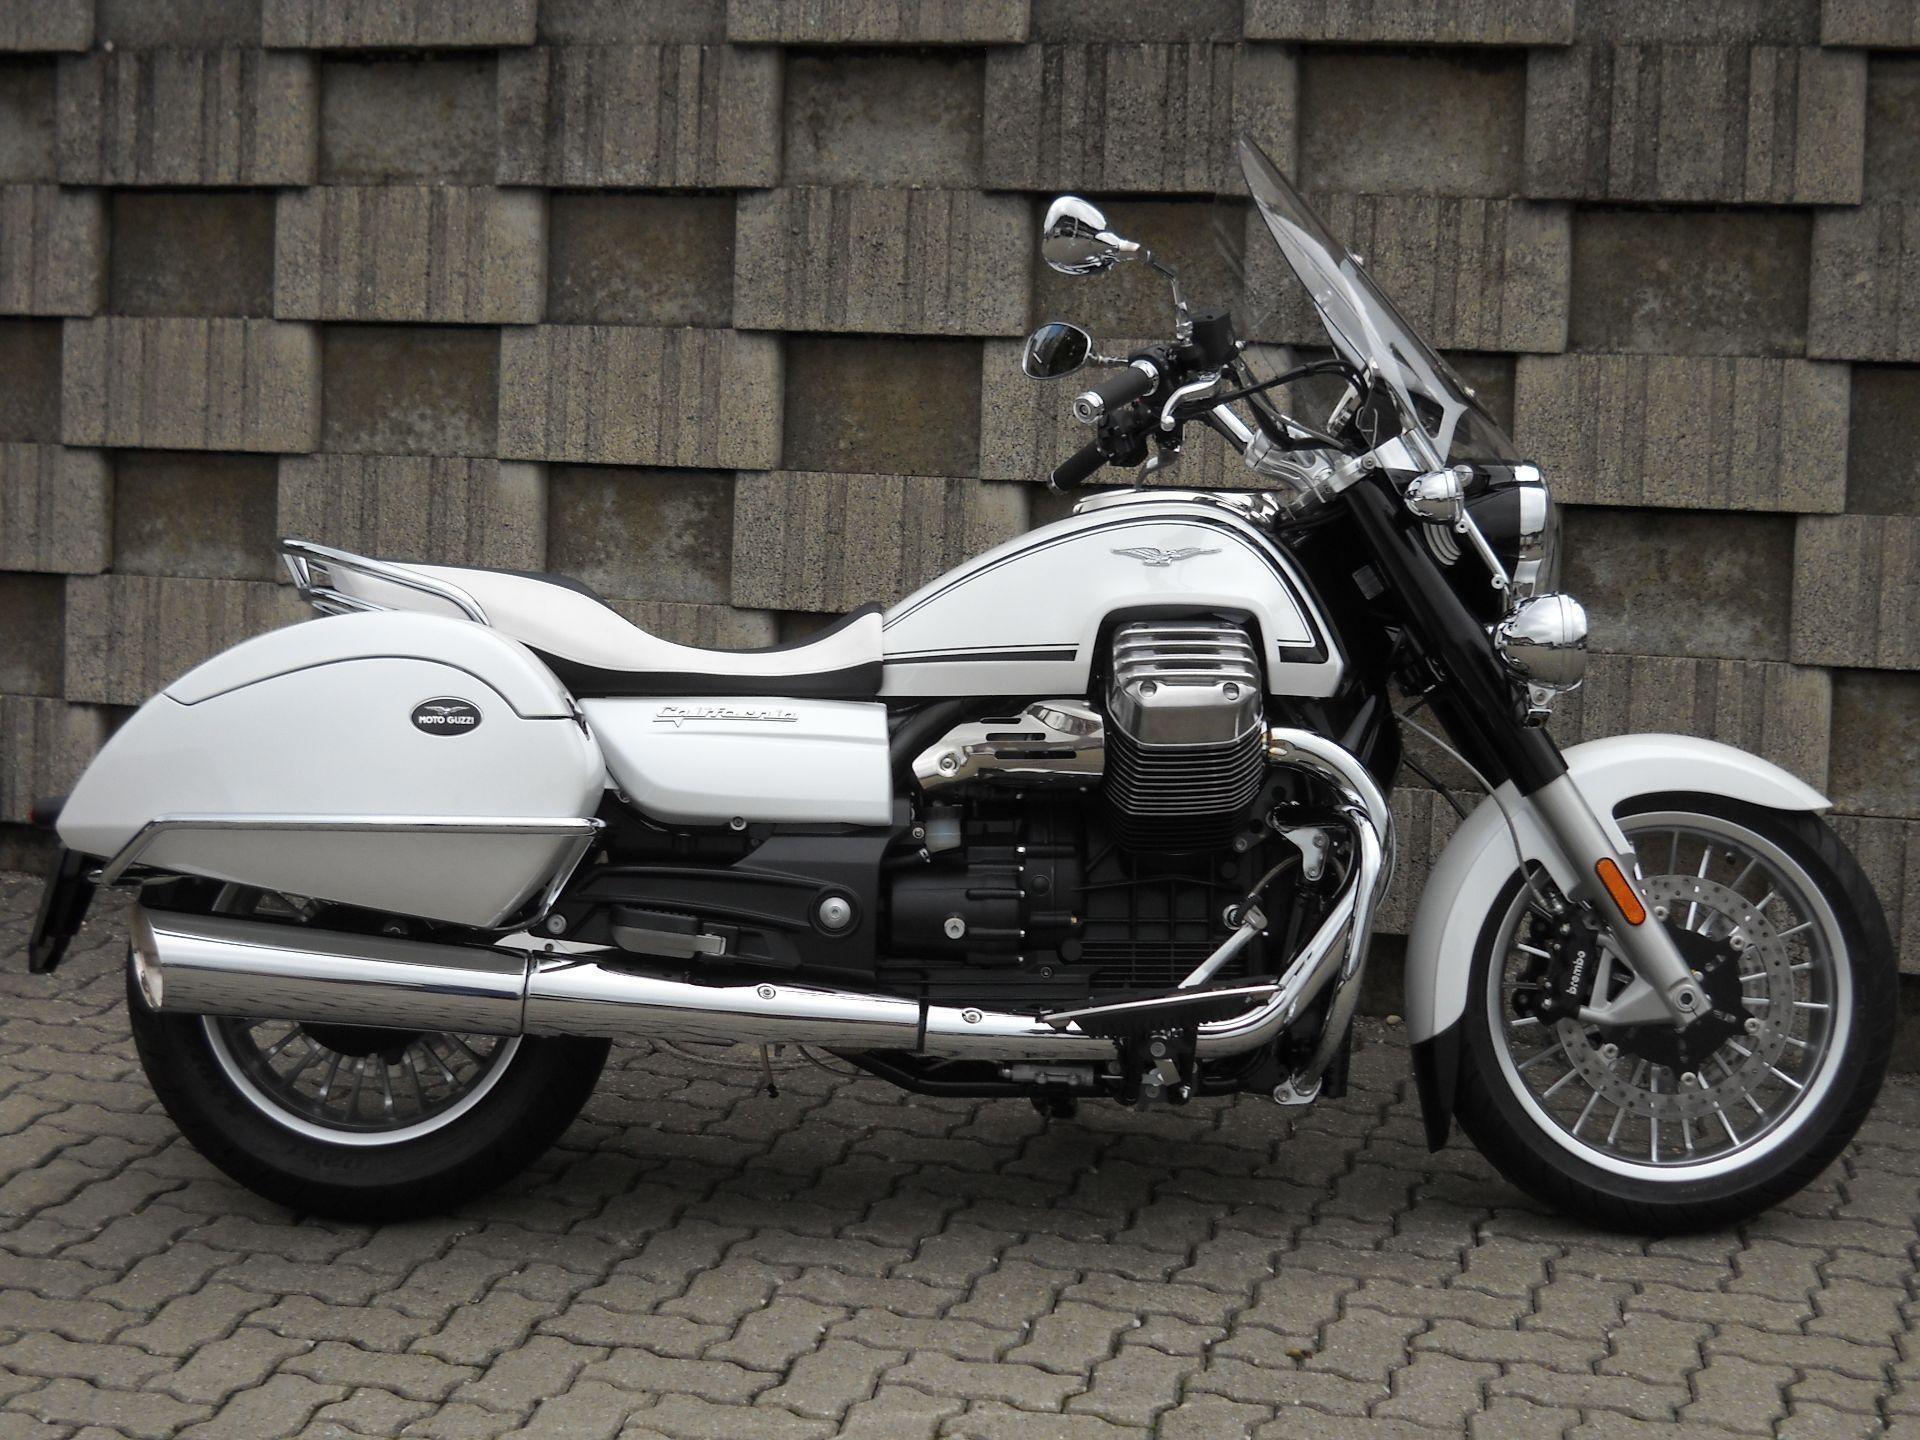 motorrad occasion kaufen moto guzzi california 1400. Black Bedroom Furniture Sets. Home Design Ideas